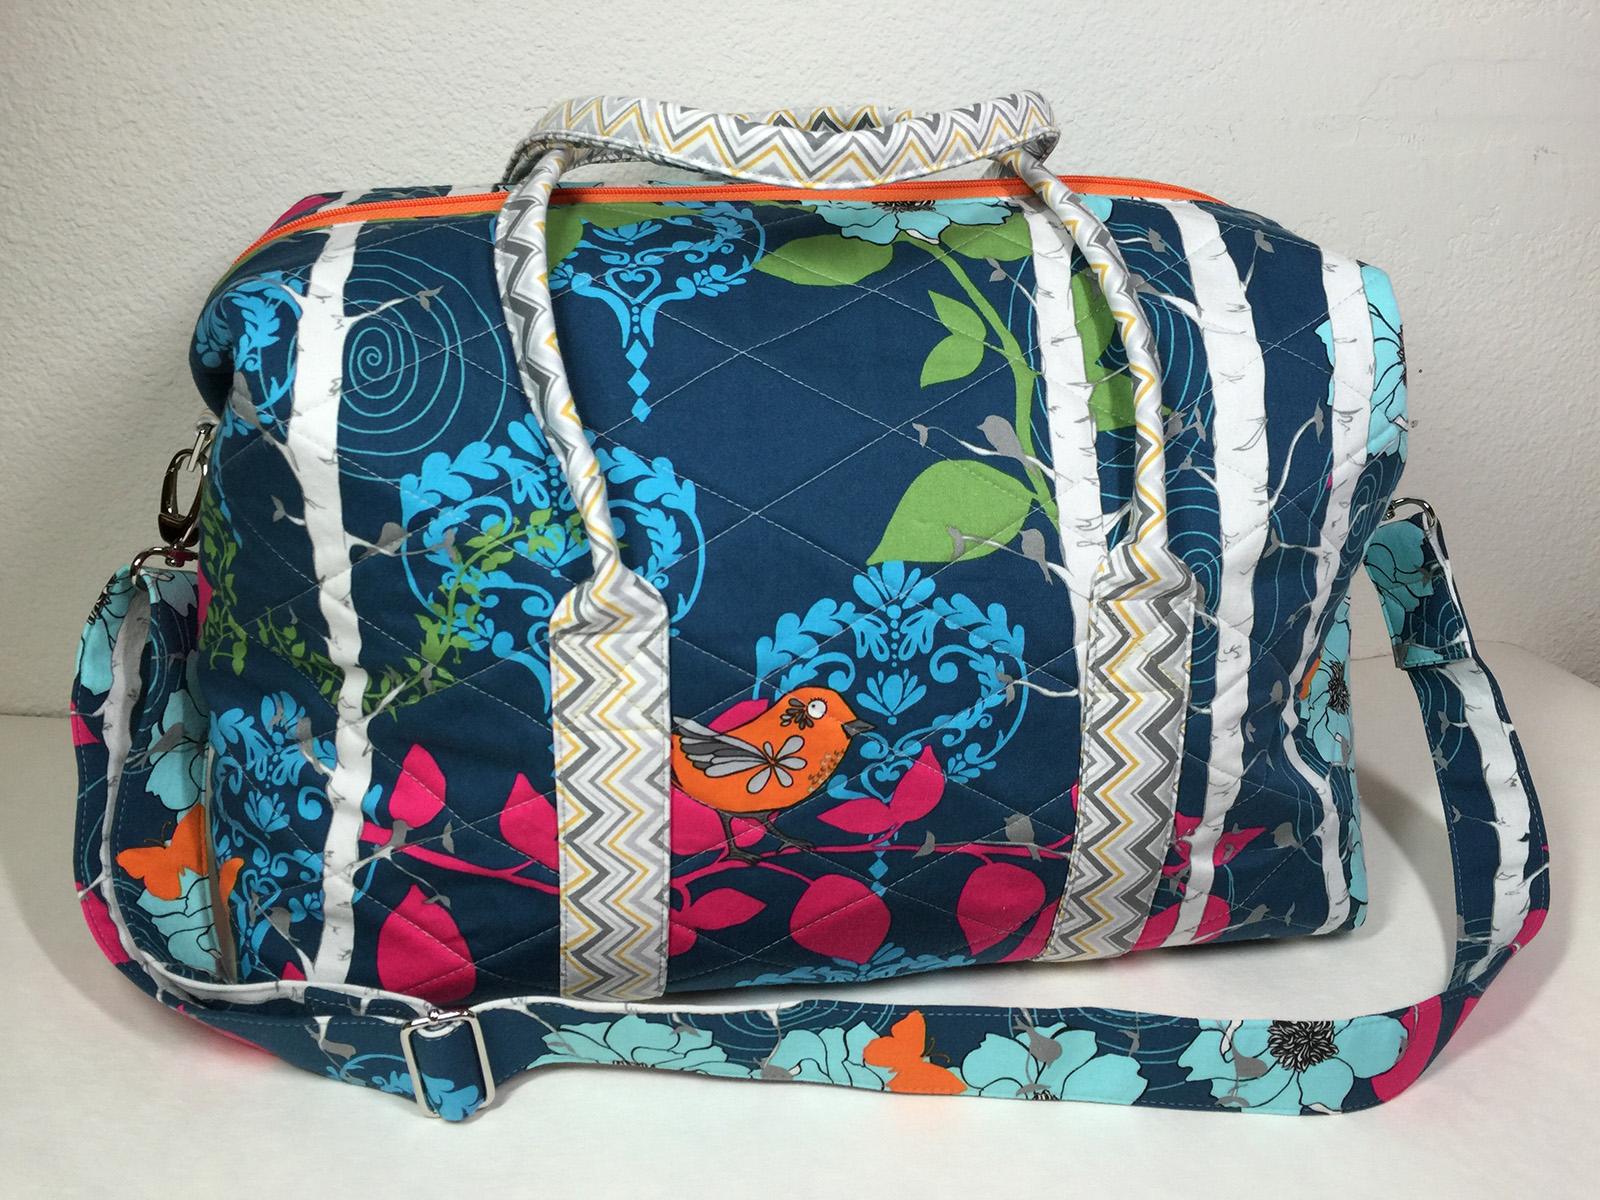 Sew Sweetness Emblem Duffle Bag, sewn by Stephanie of Thread Ov Metal